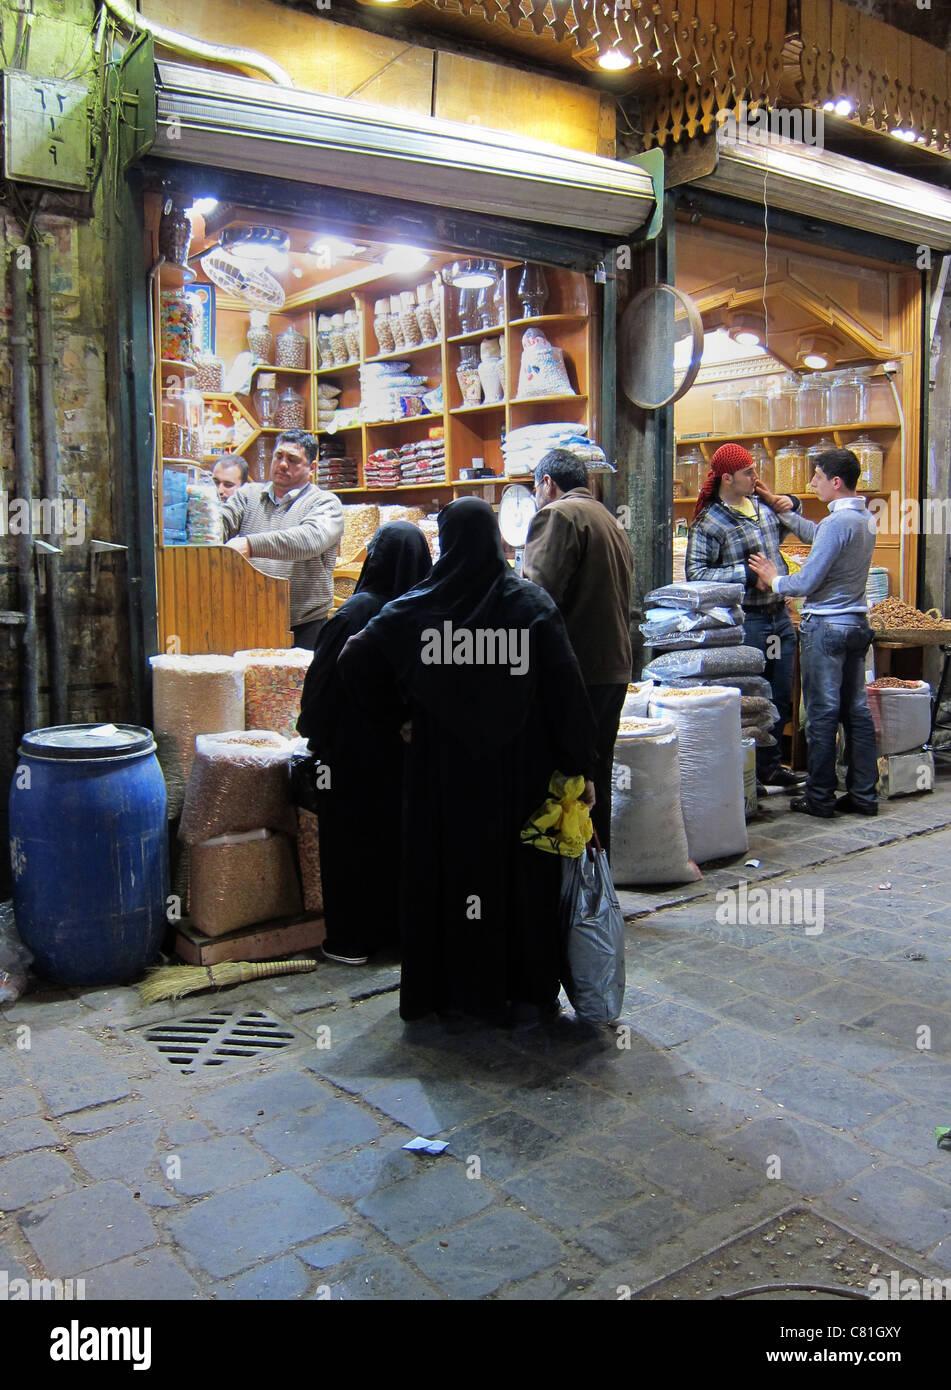 Aleppo, Syria, Syrien Souk Bazar, Markt - Stock Image